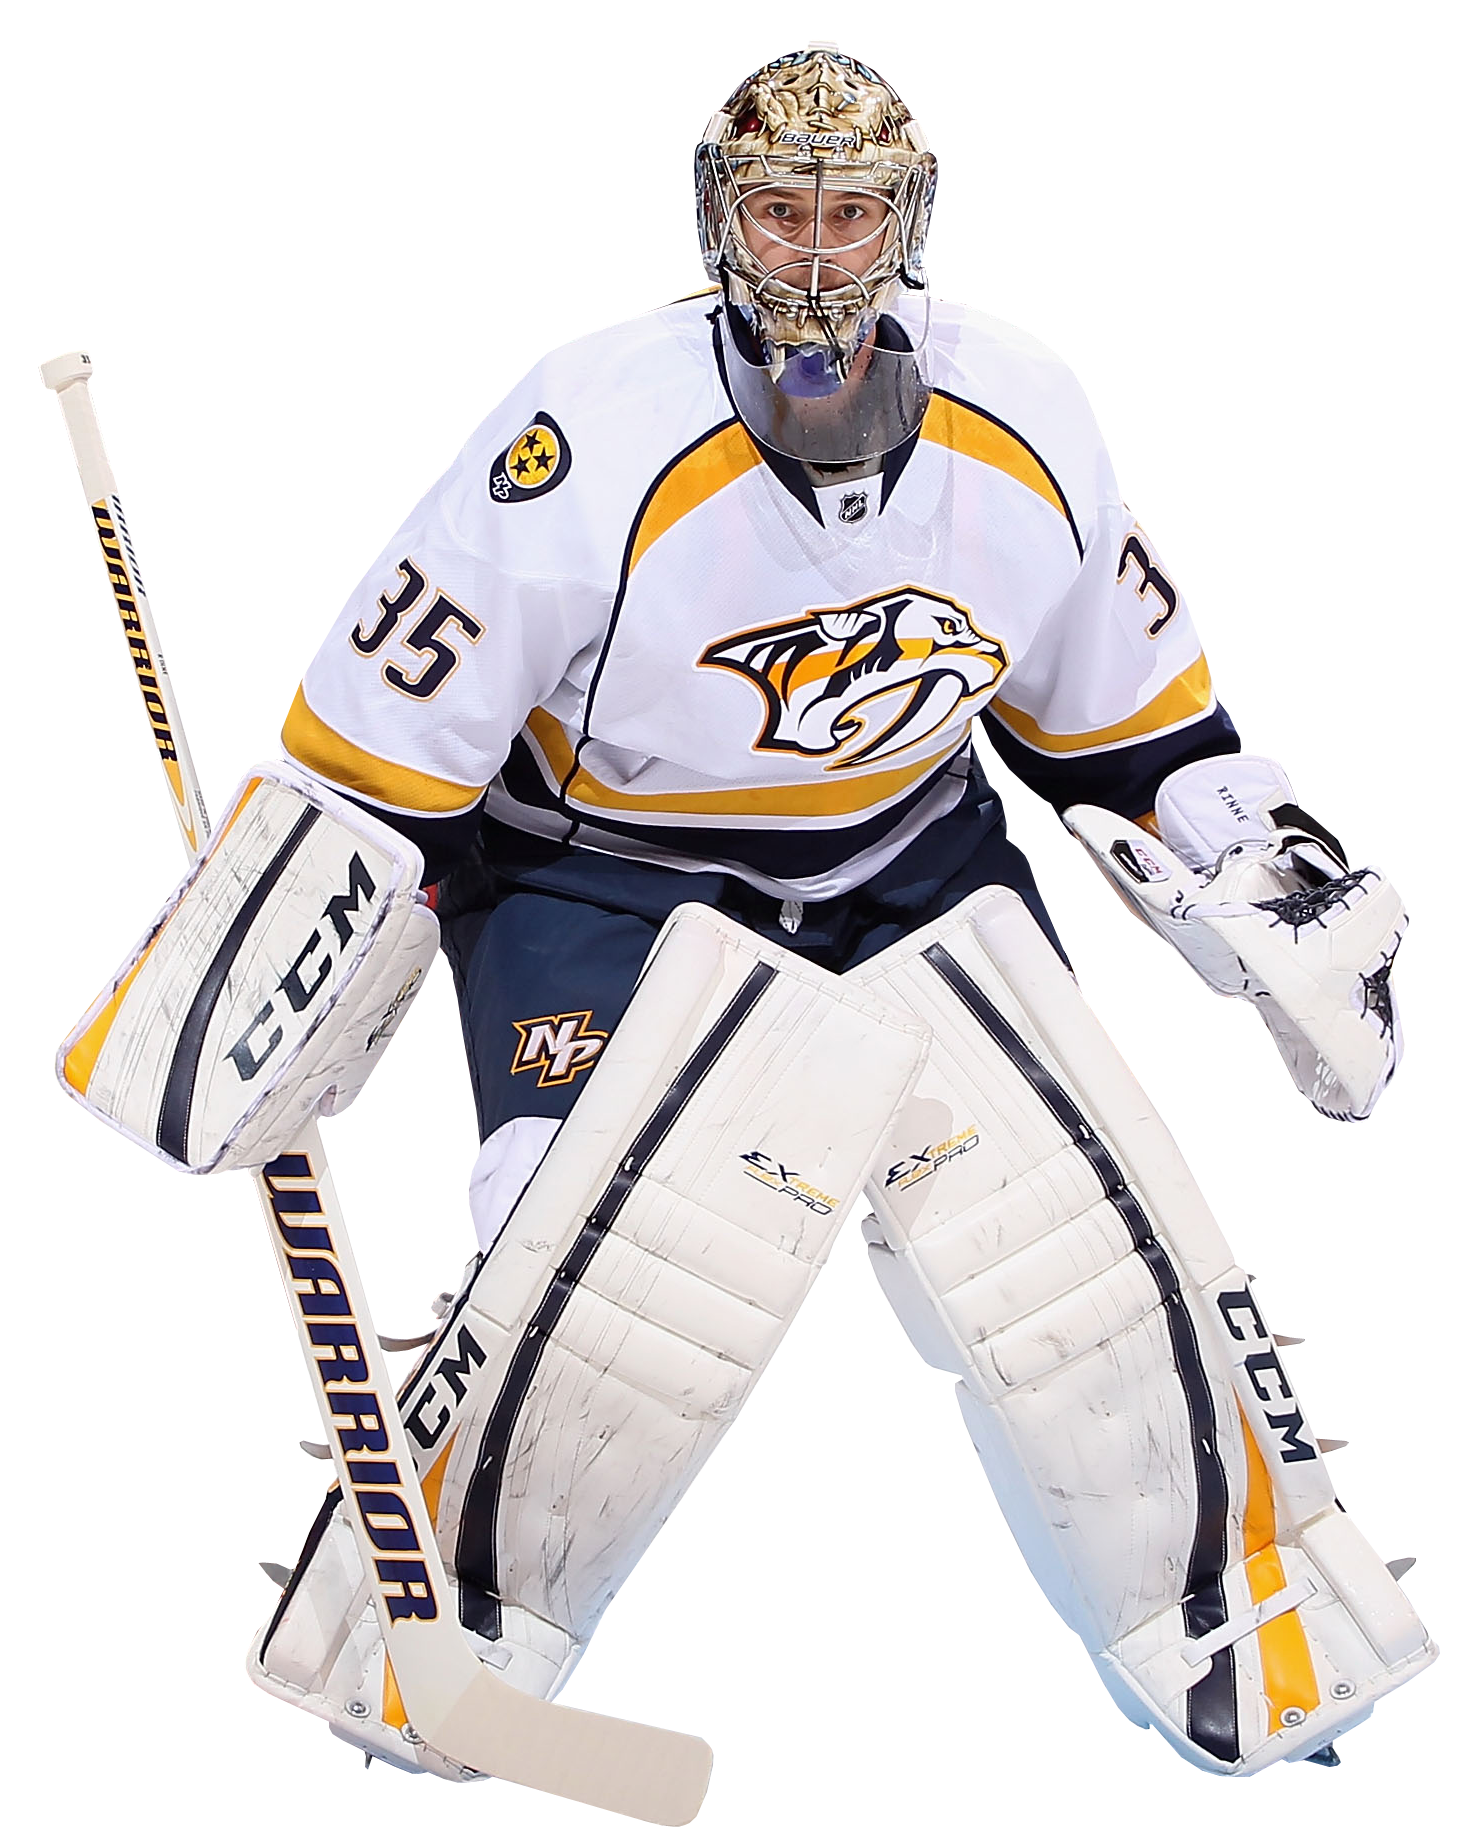 Hockey clipart hockey goalie. Player png image purepng